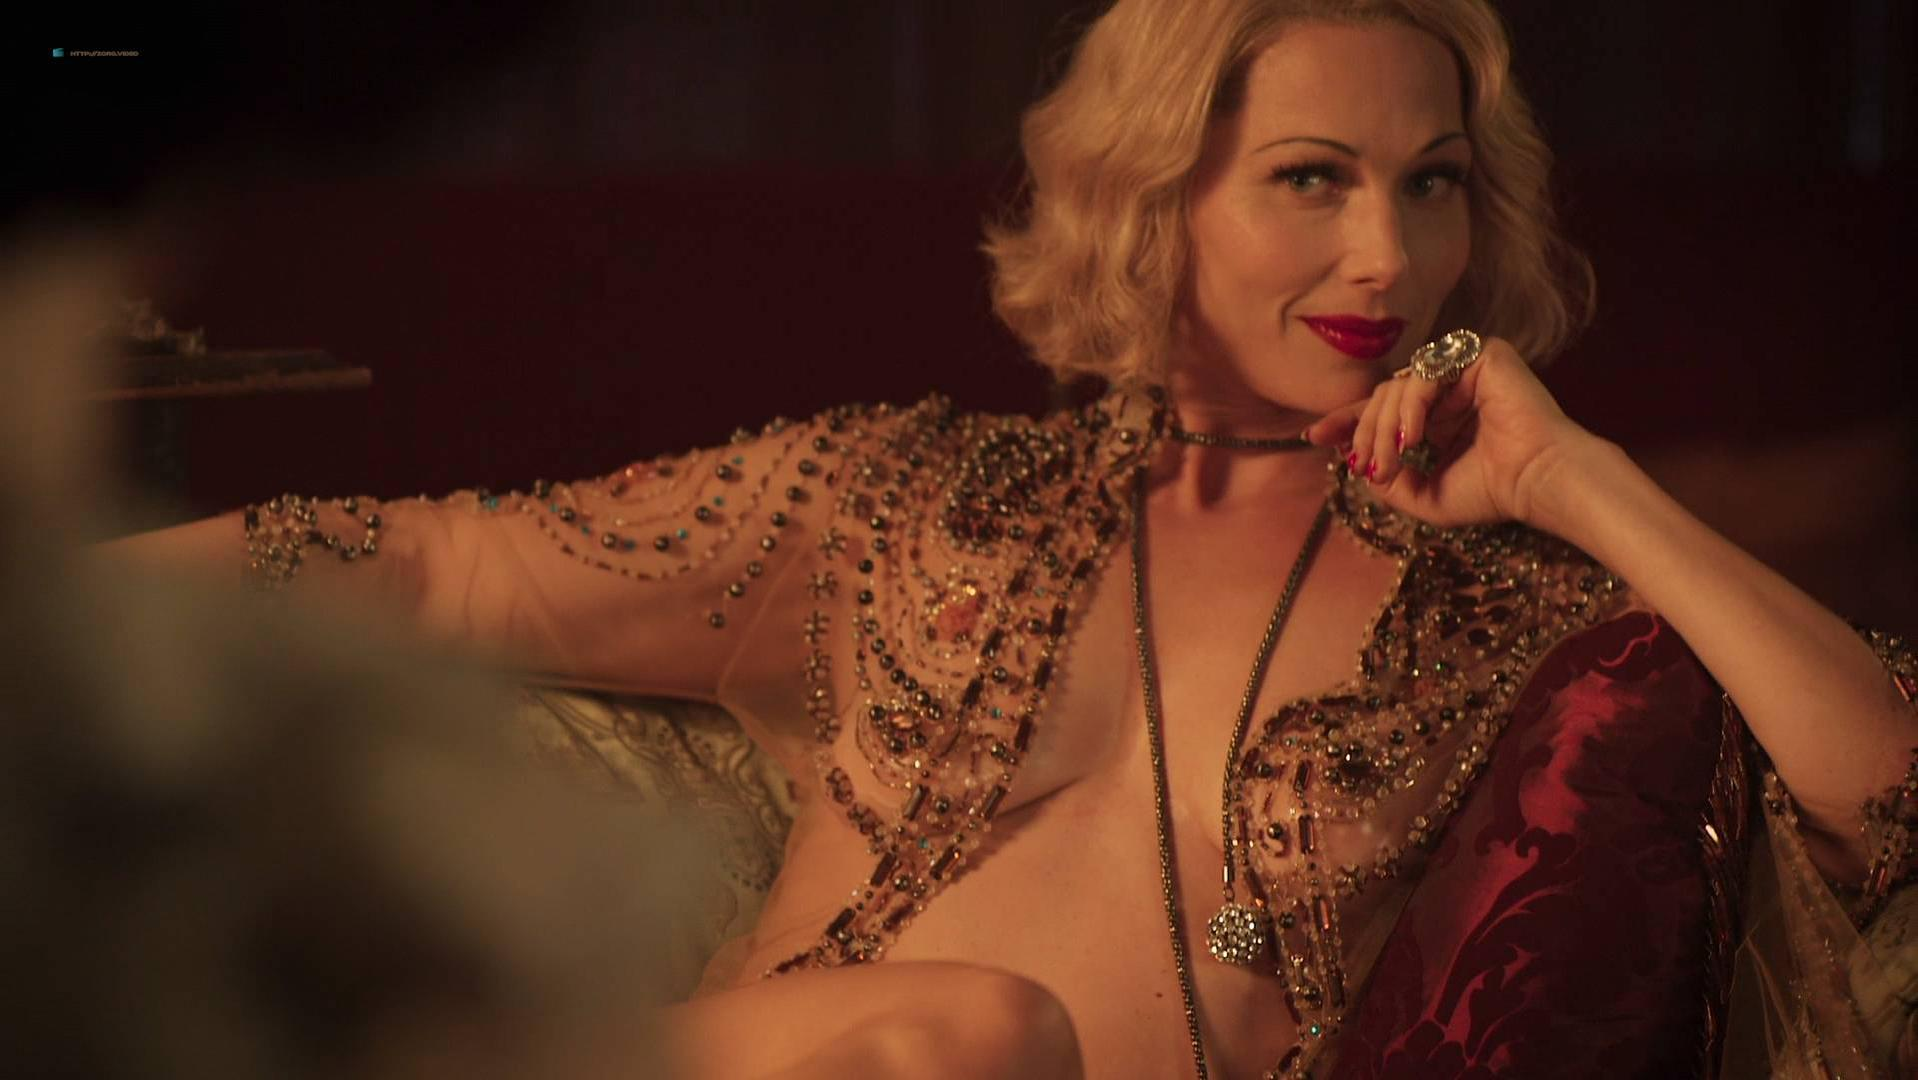 Stefanie von Pfetten sexy, Carina Conti nude, Chanon Finley nude, Sarah French nude - The Last Tycoon s01e04 (2017)